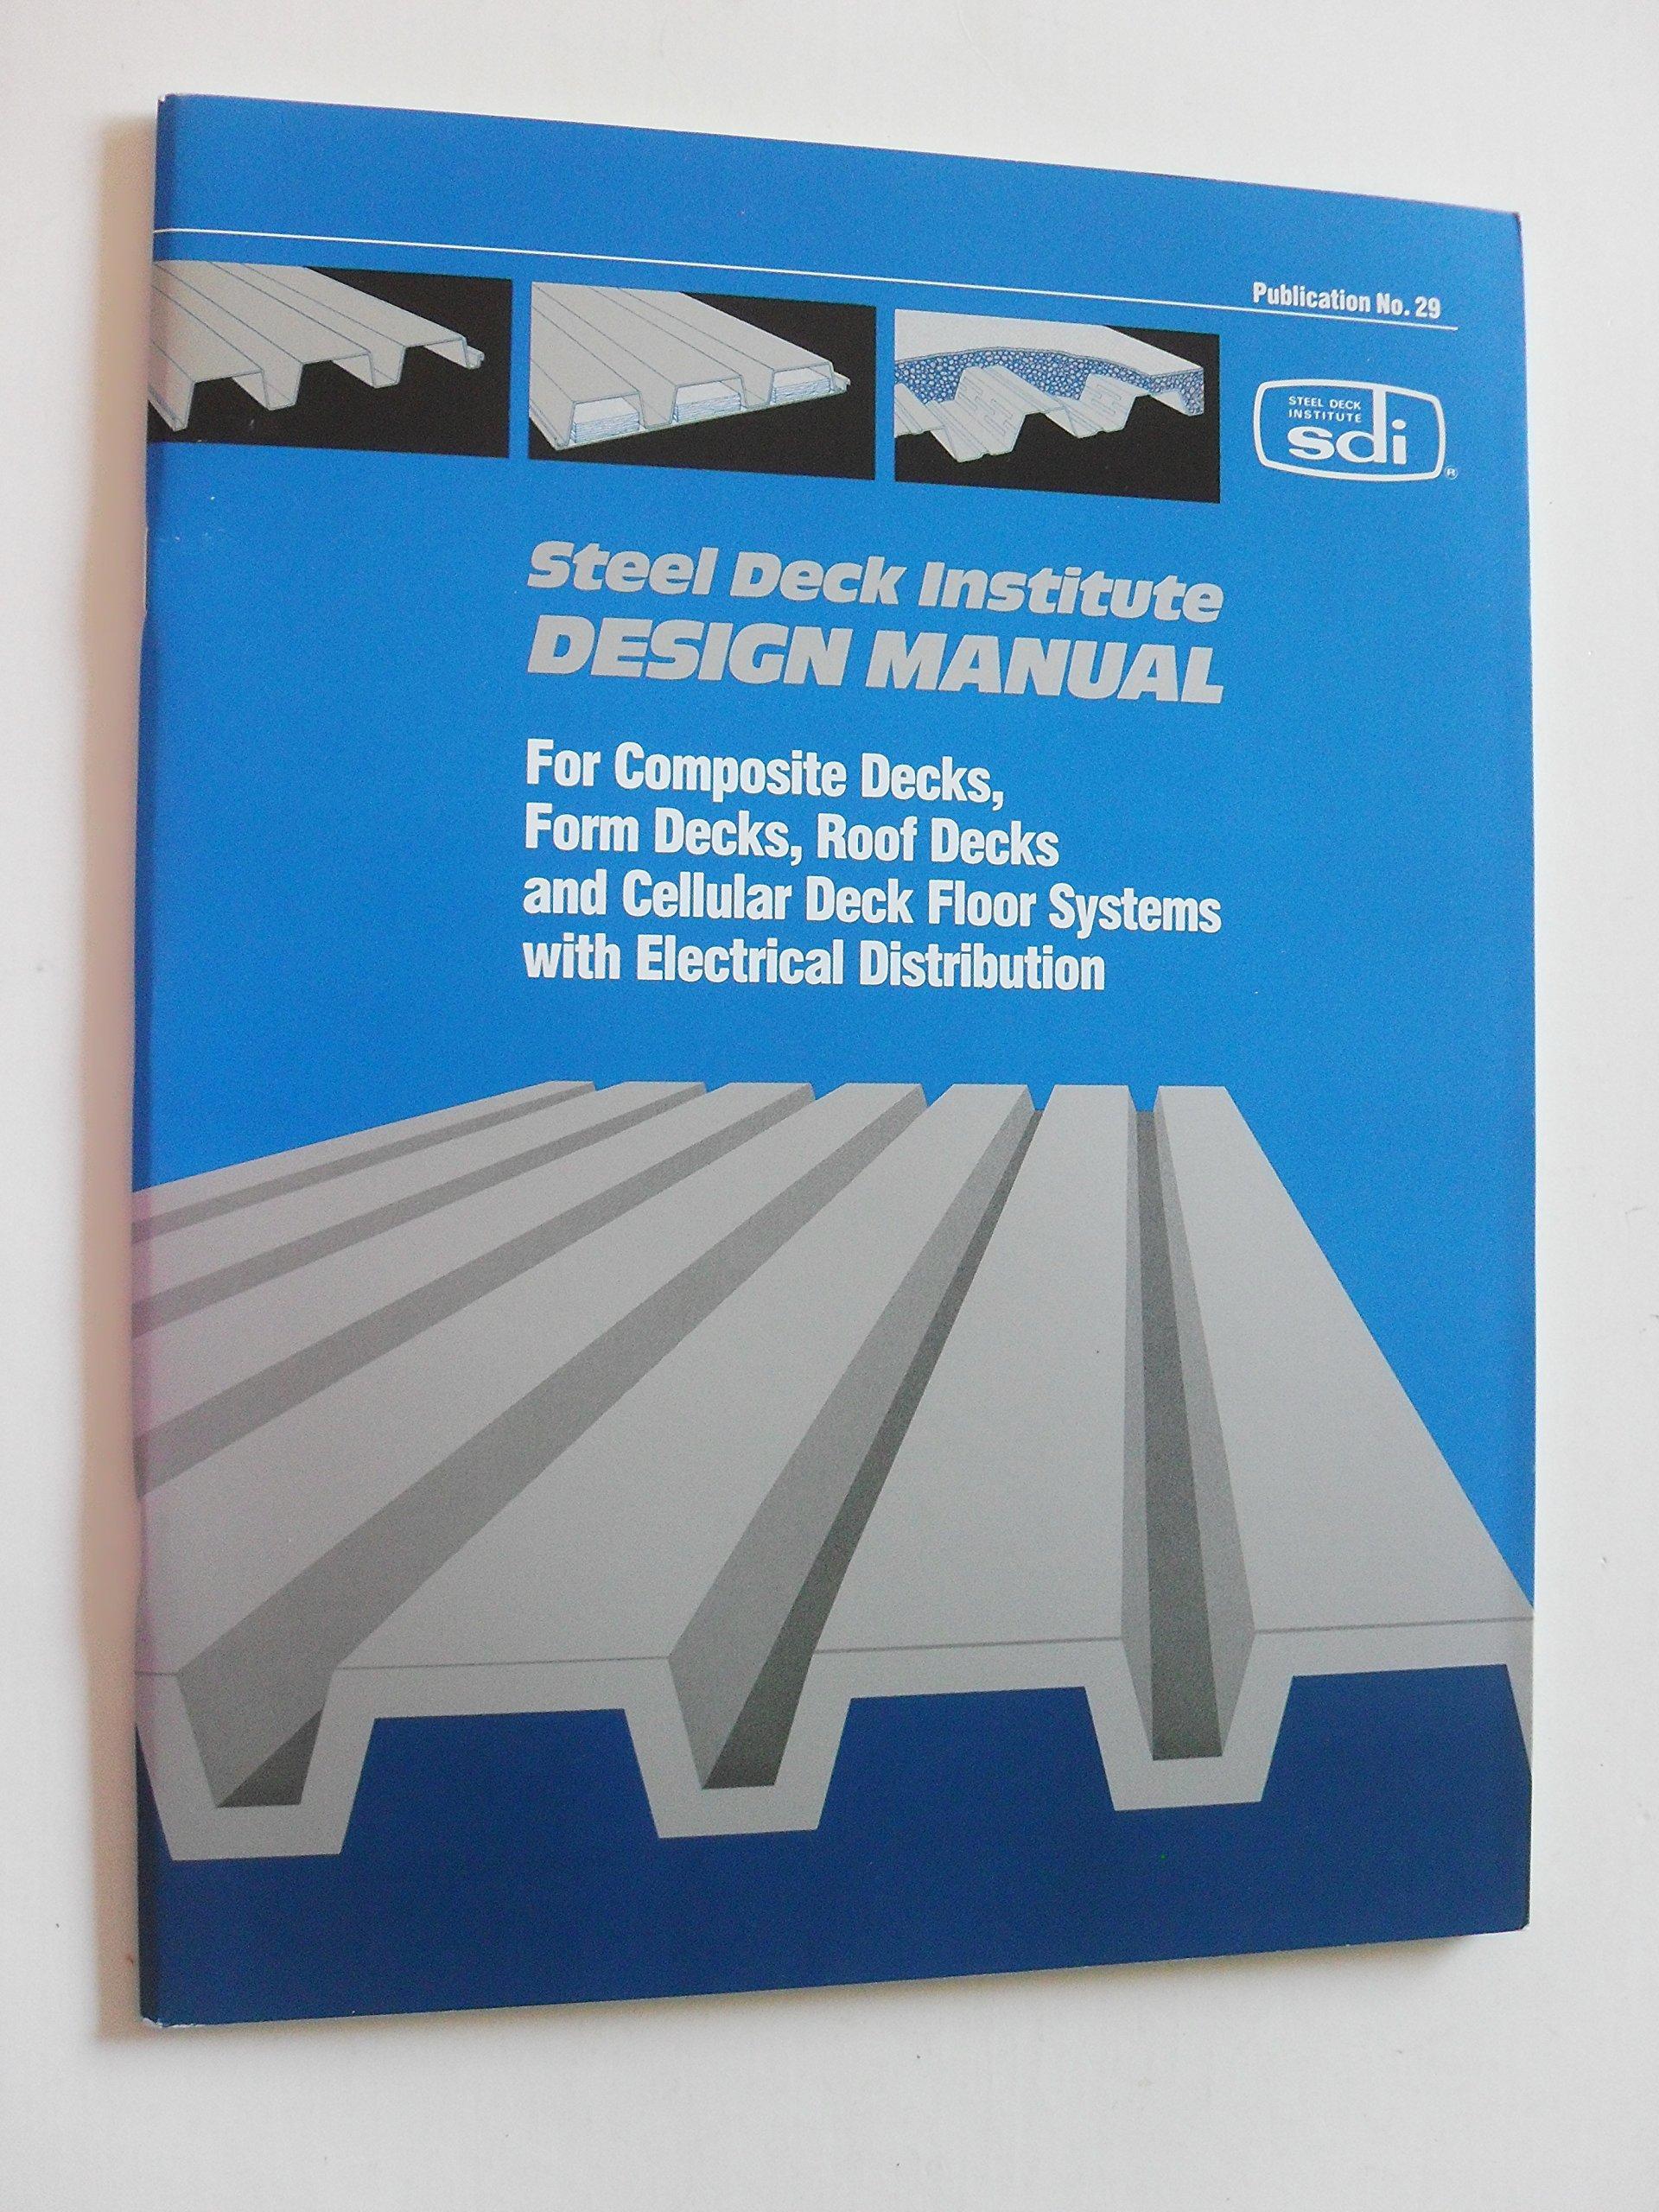 Steel Deck Institute Inc Design Manual For Composite Decks Form Decks And Roof Decks Steel Deck Institute Inc Amazon Com Books